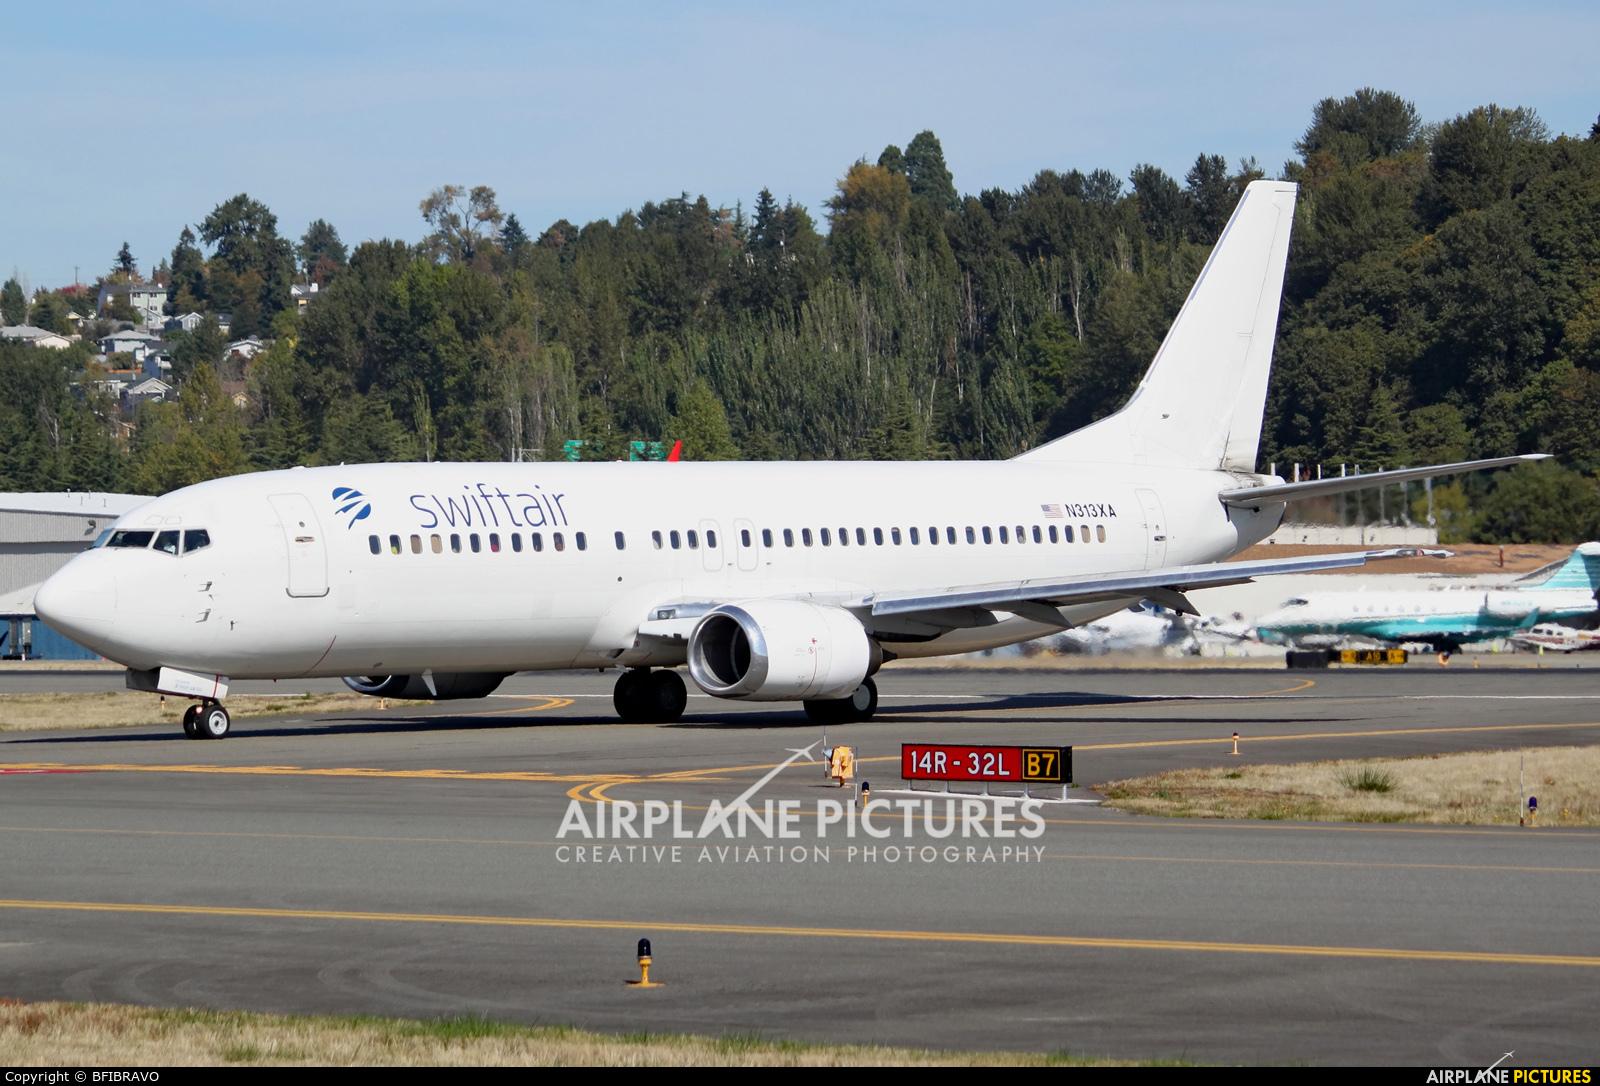 Swiftair N313XA aircraft at Seattle - Boeing Field / King County Intl